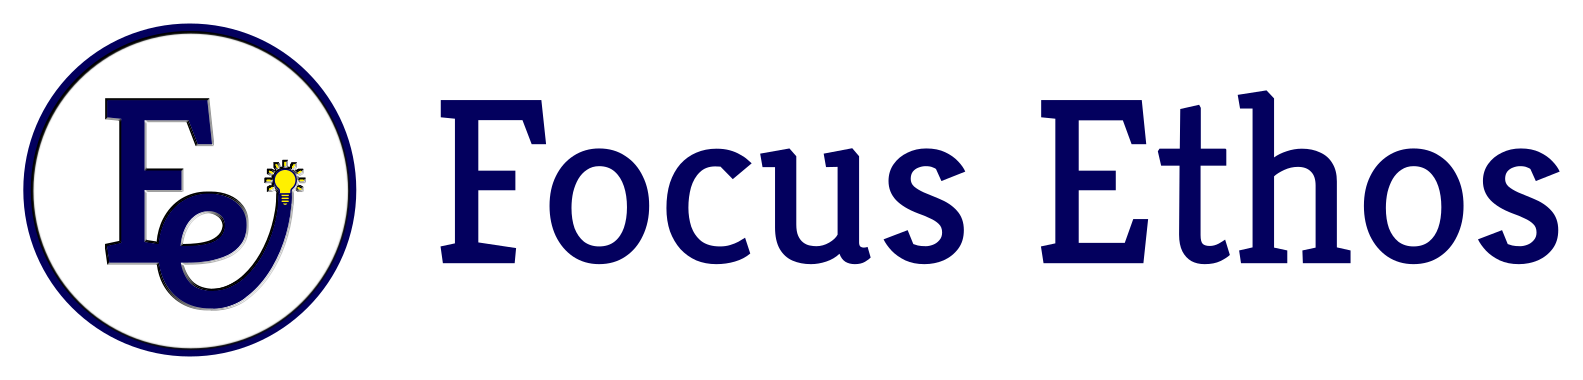 FocusEthos